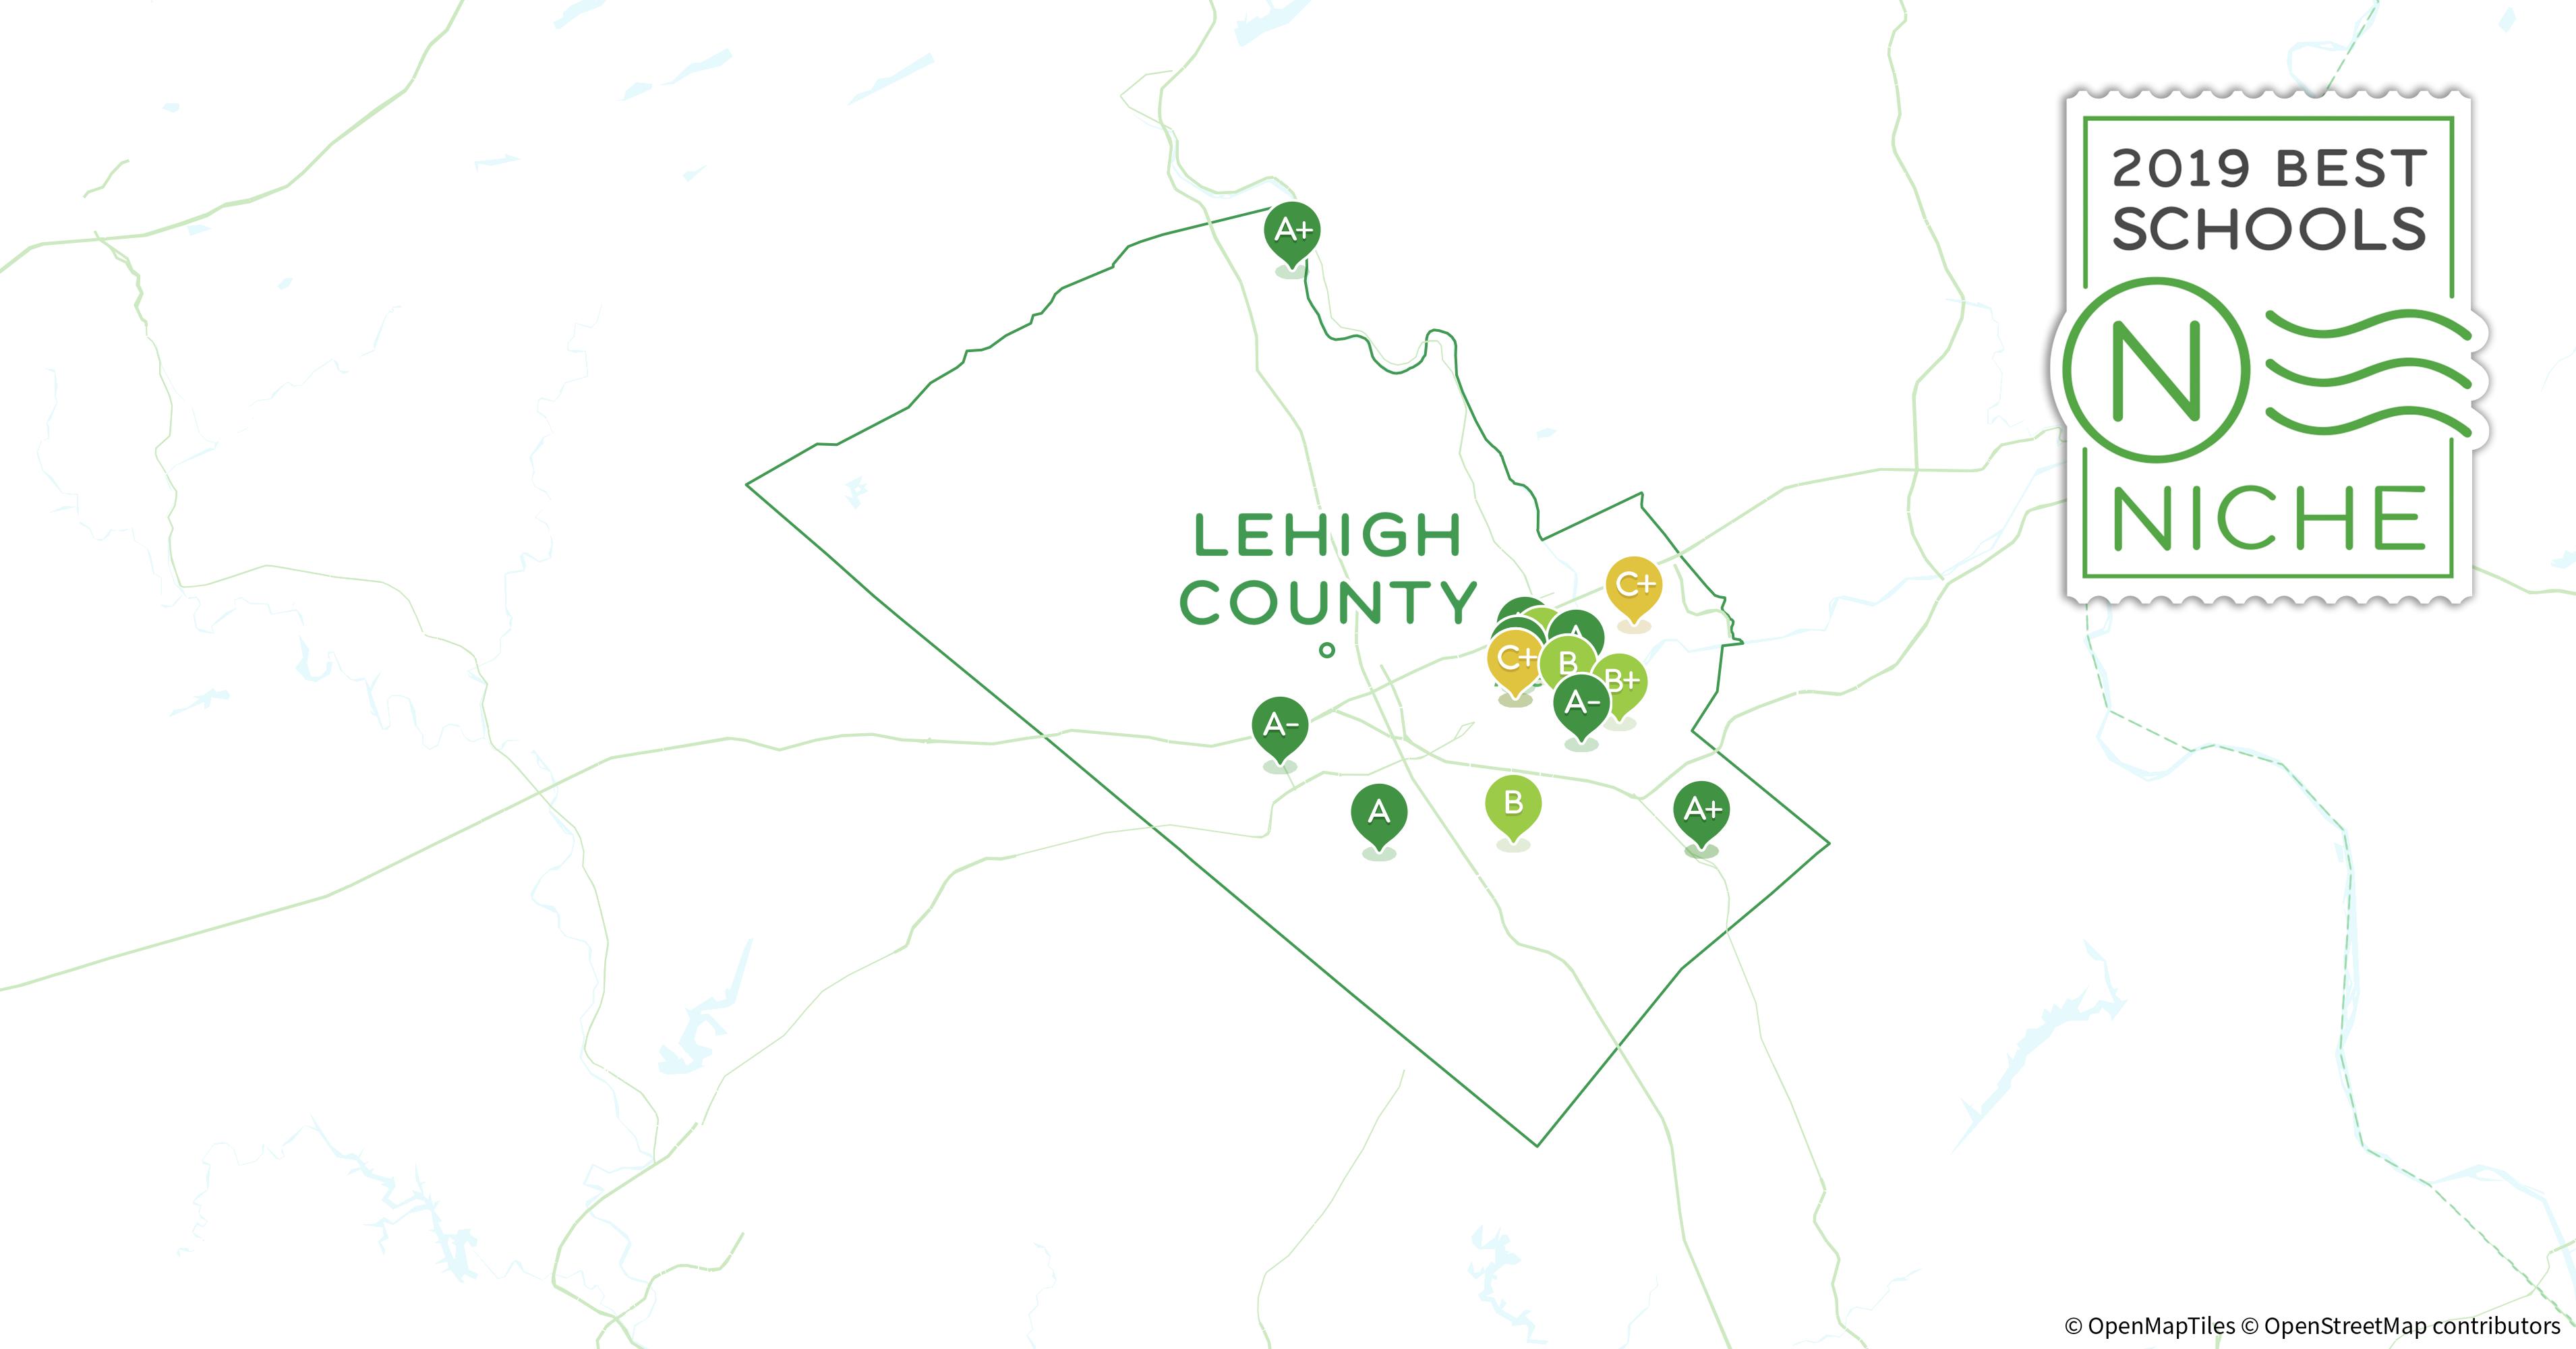 Charter Schools In Lehigh County Pa Niche